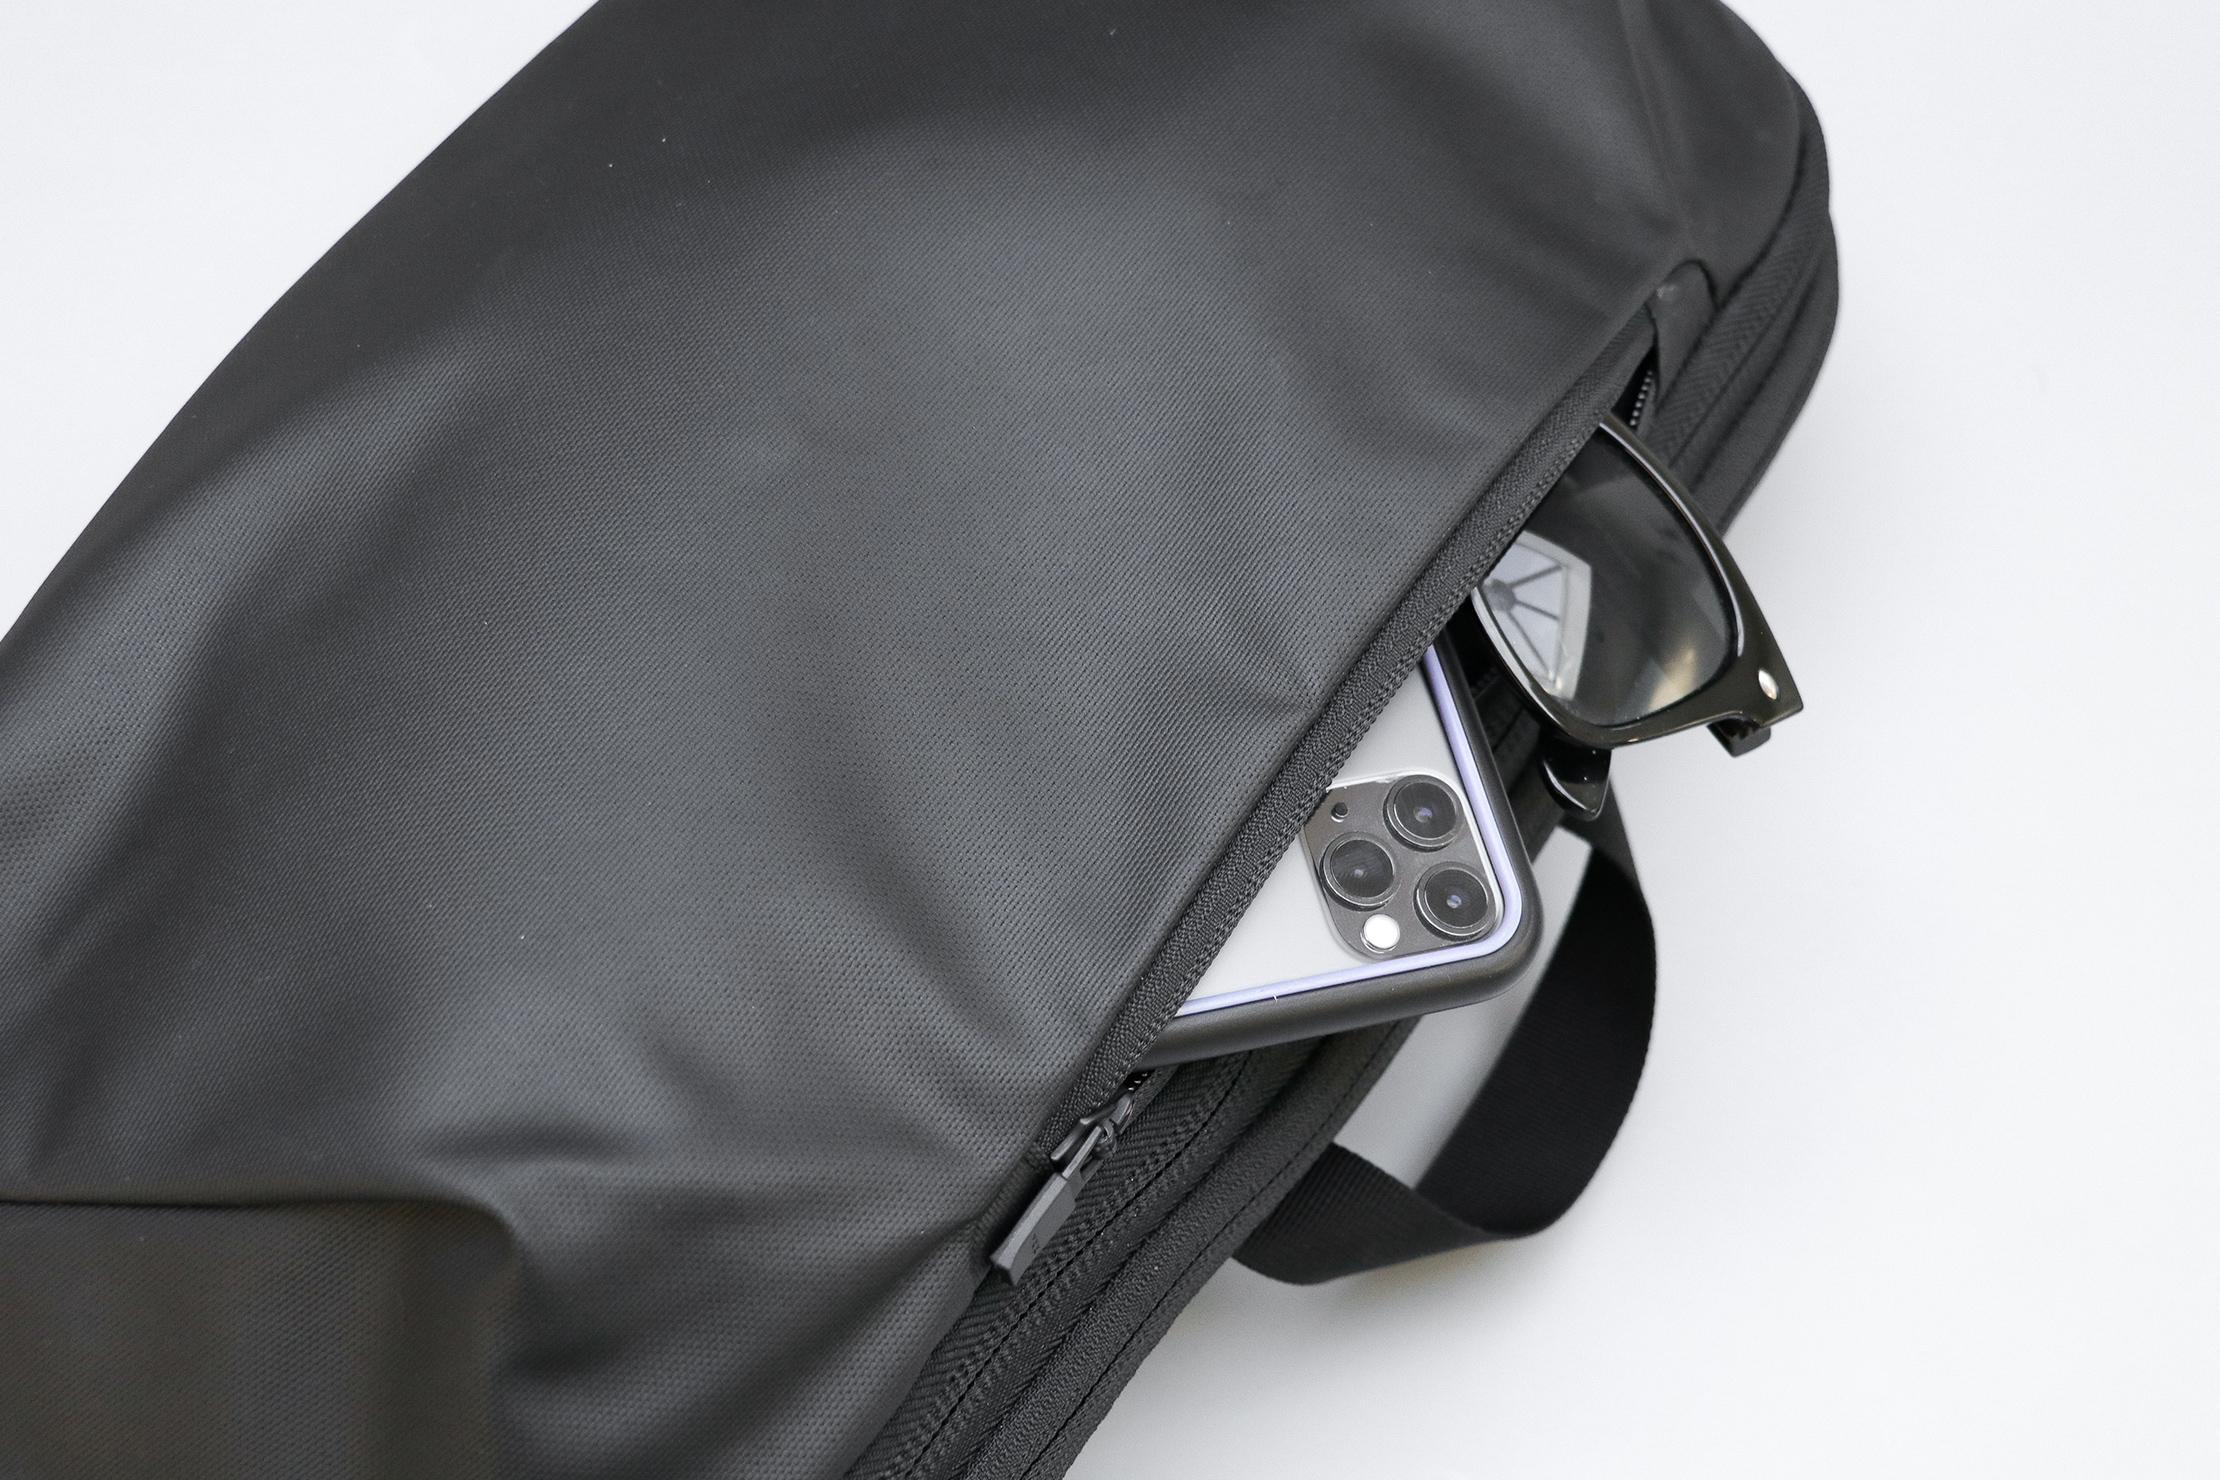 Aer Tech Sling 2 Quick-Grab Pocket